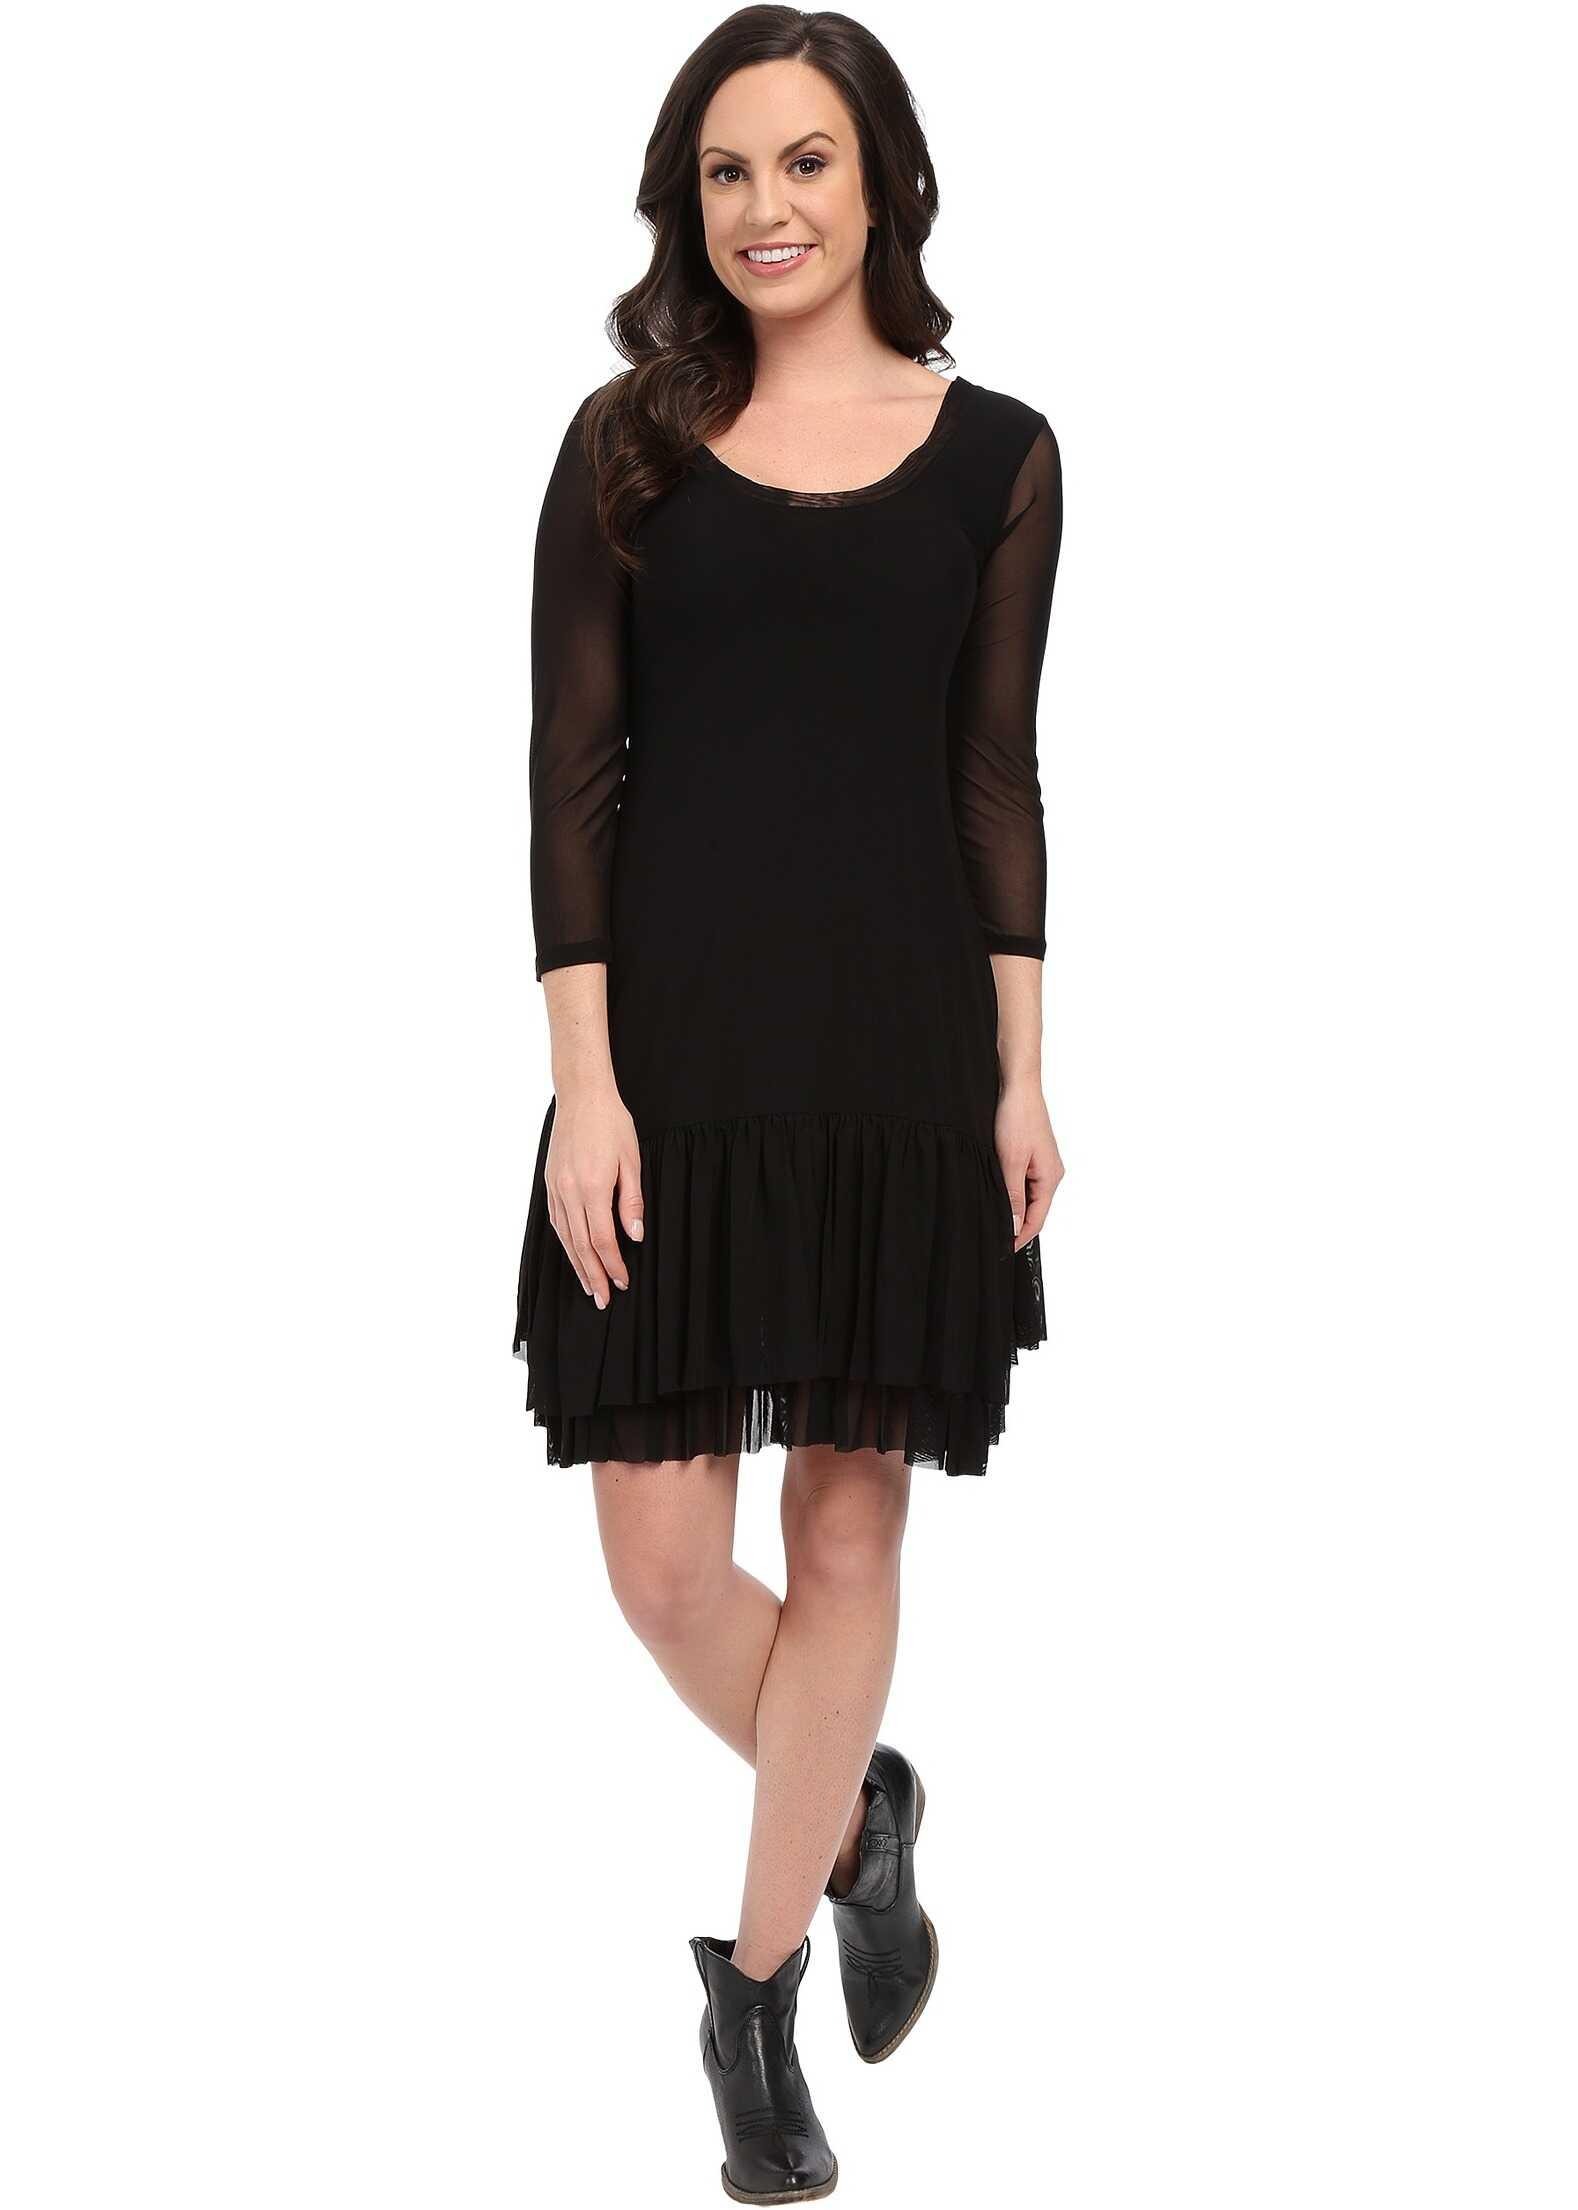 Roper 9922 Solid Stretch Mesh Flounced Dress Black